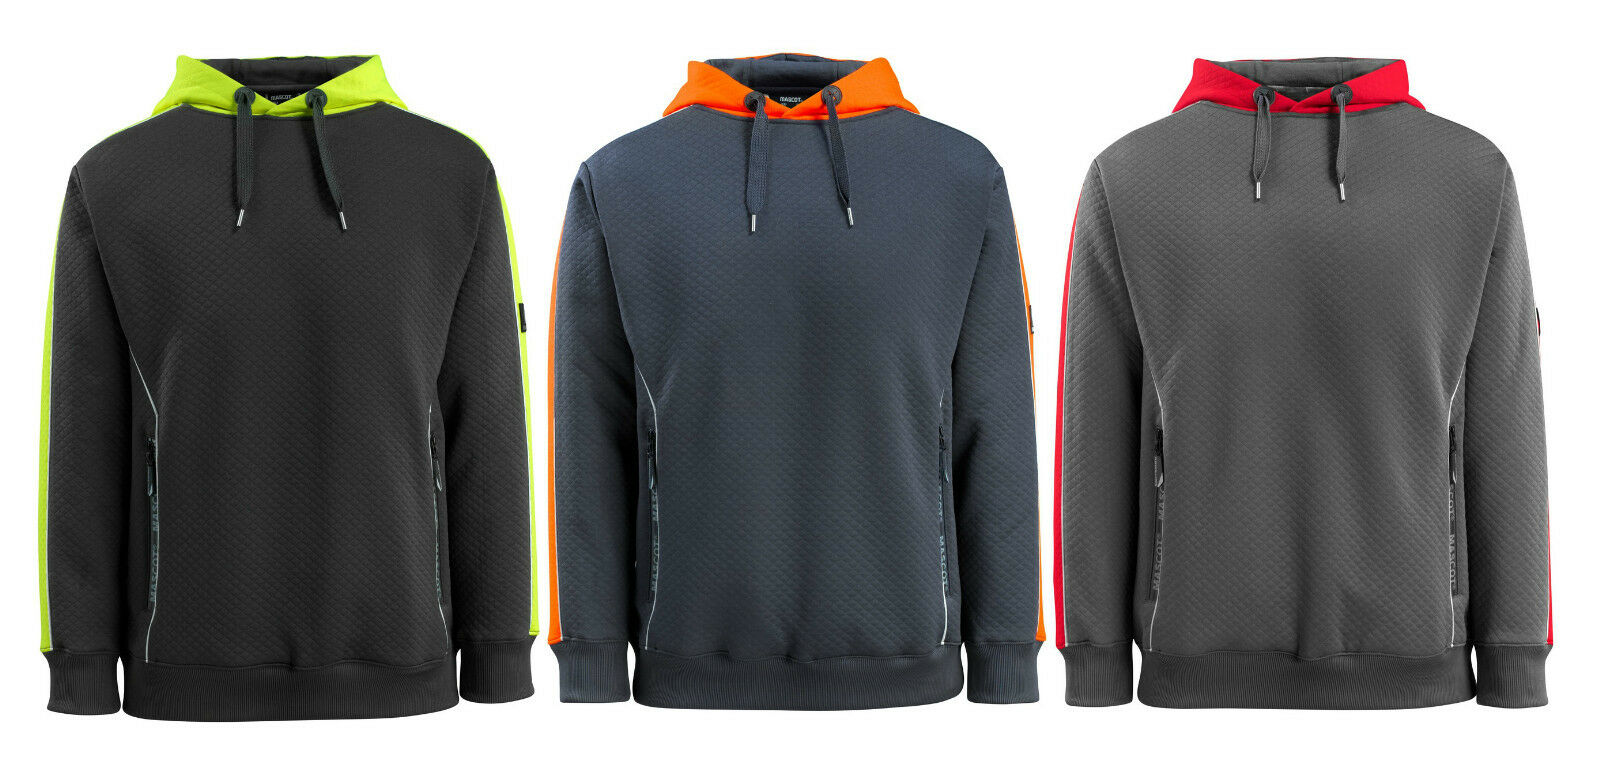 MASCOT® HARDWEAR Motril Kapuzen-Sweatshirt mit Reflex-Effekten Sweater S - 4XL